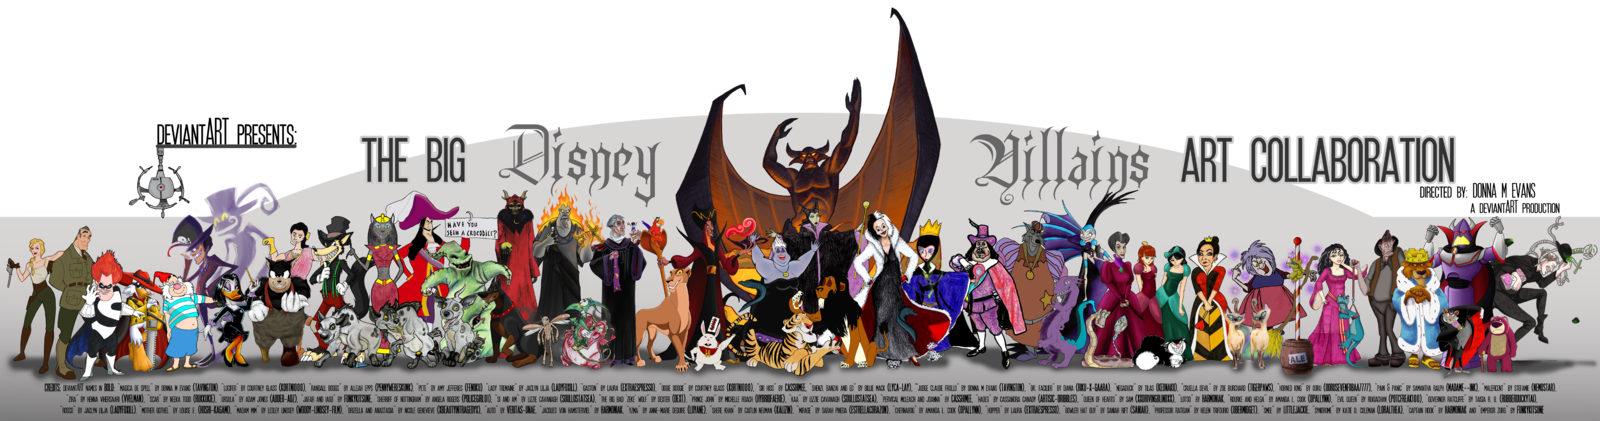 Big villains art collab. Hook clipart disney villans